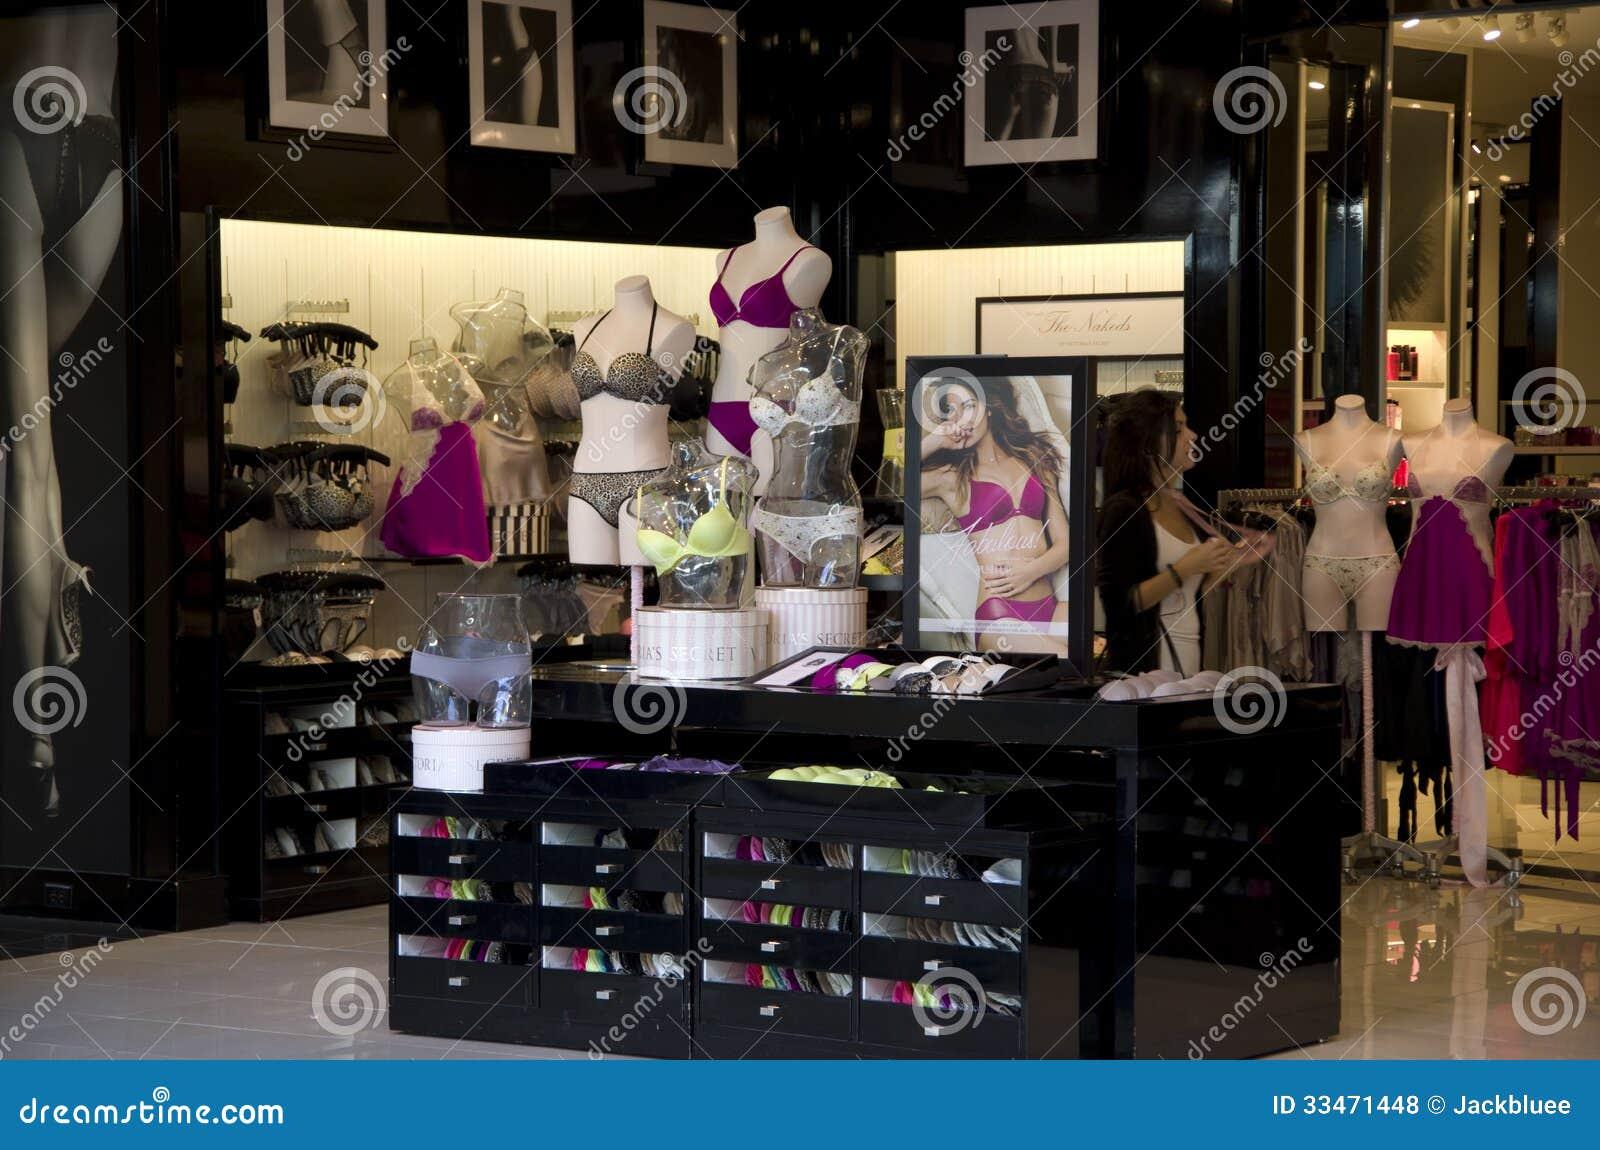 A store display. Victoria's Secret in Las Vegas, Nevada